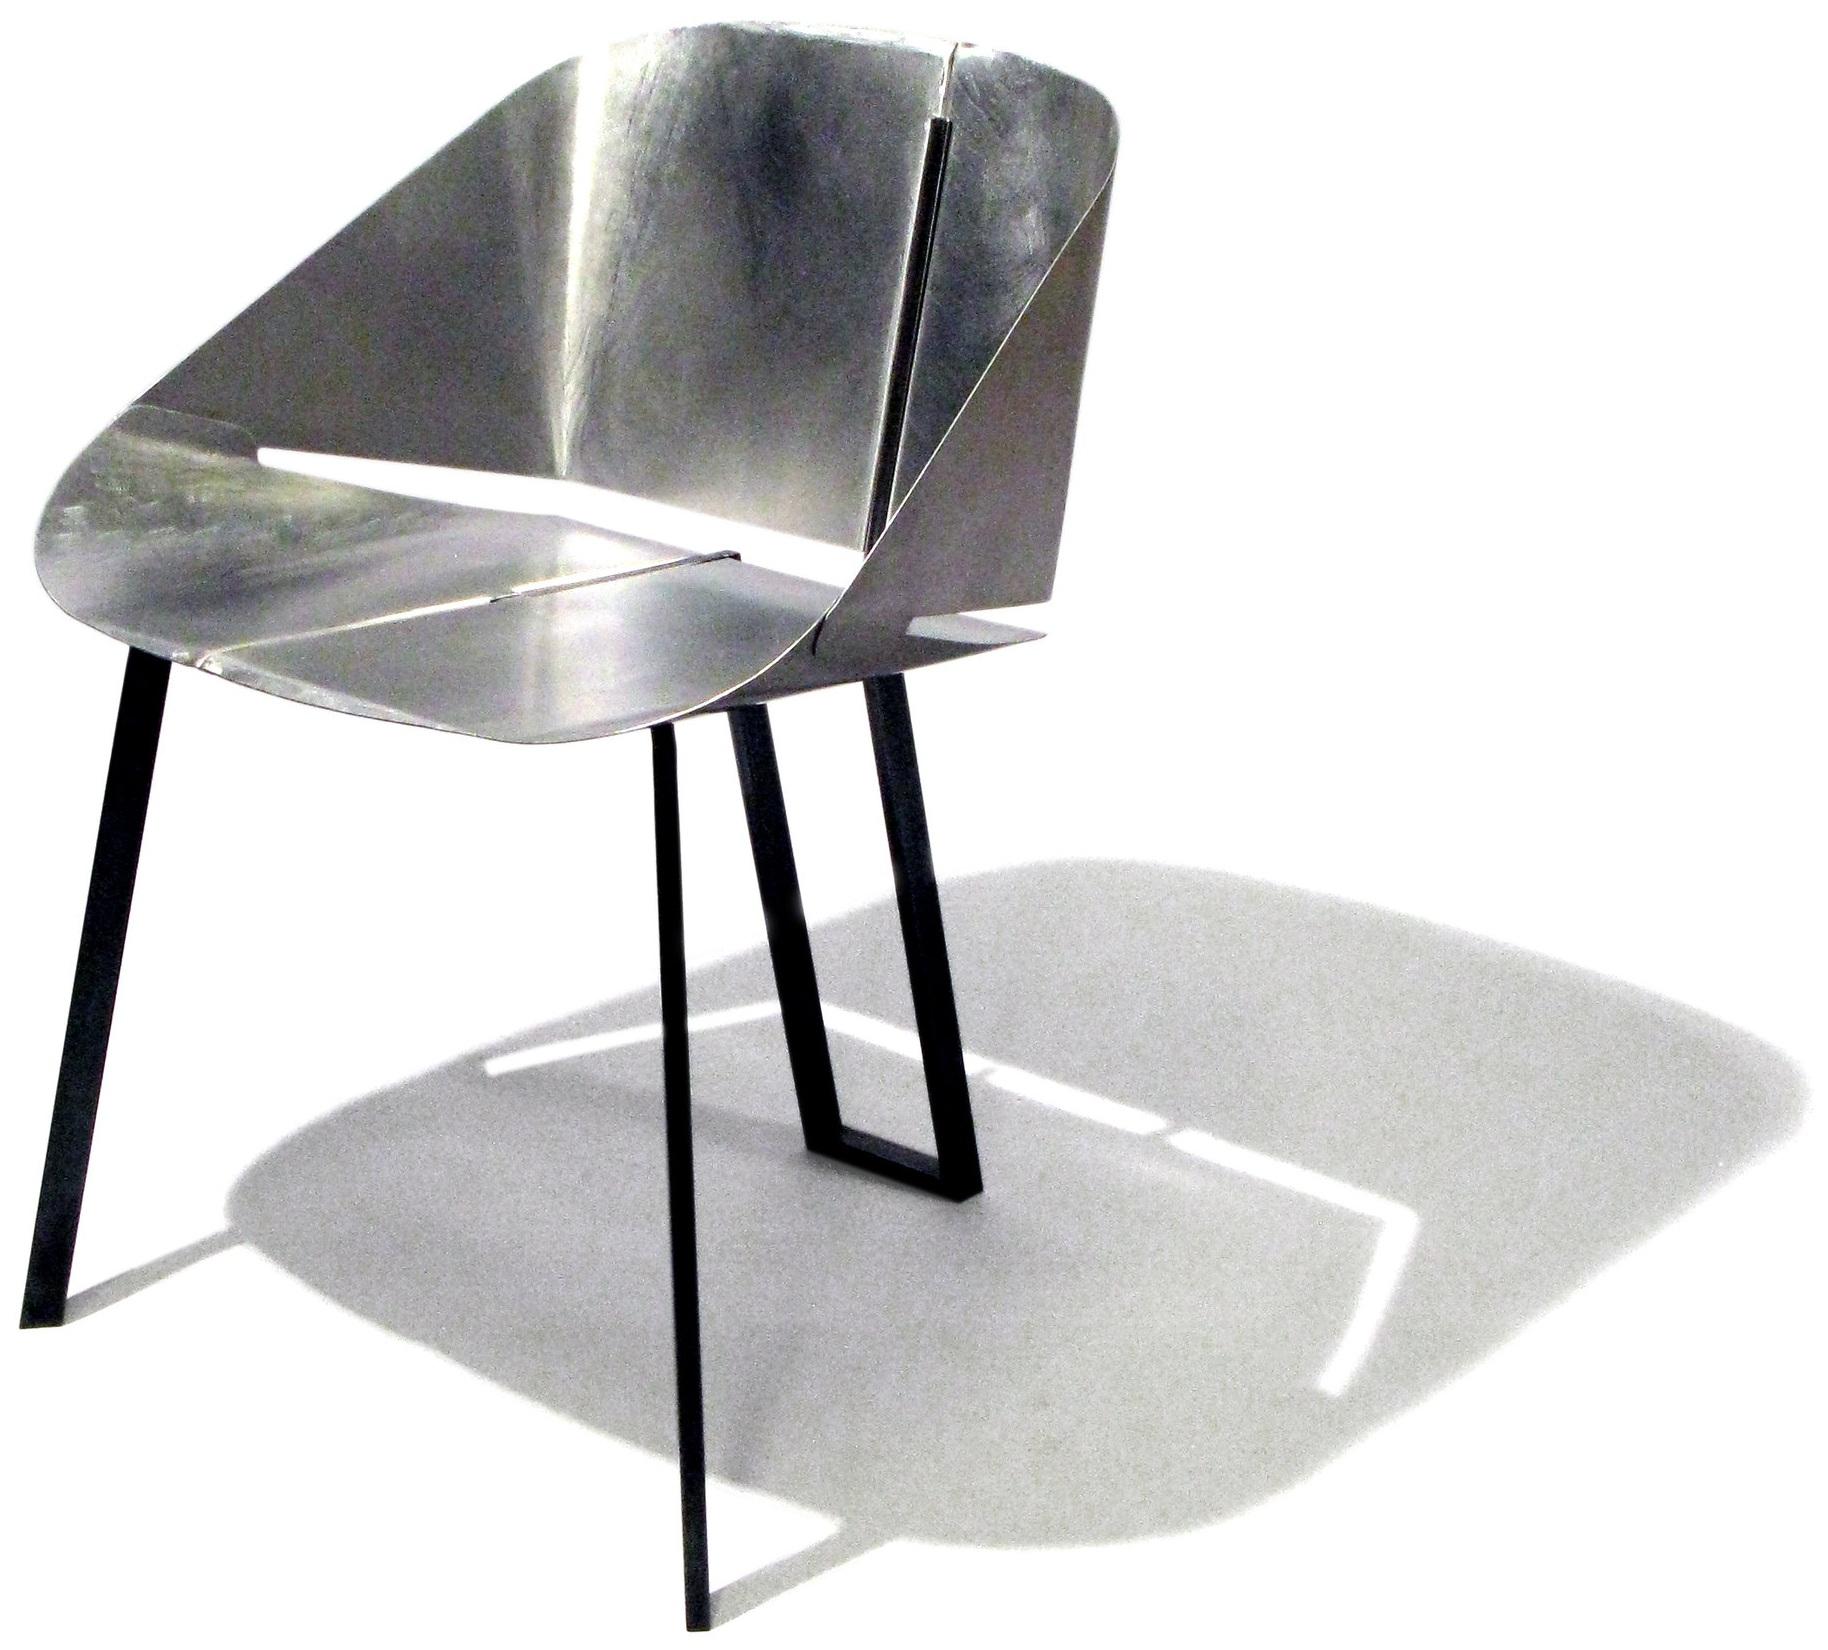 Chioggia Chair prototype